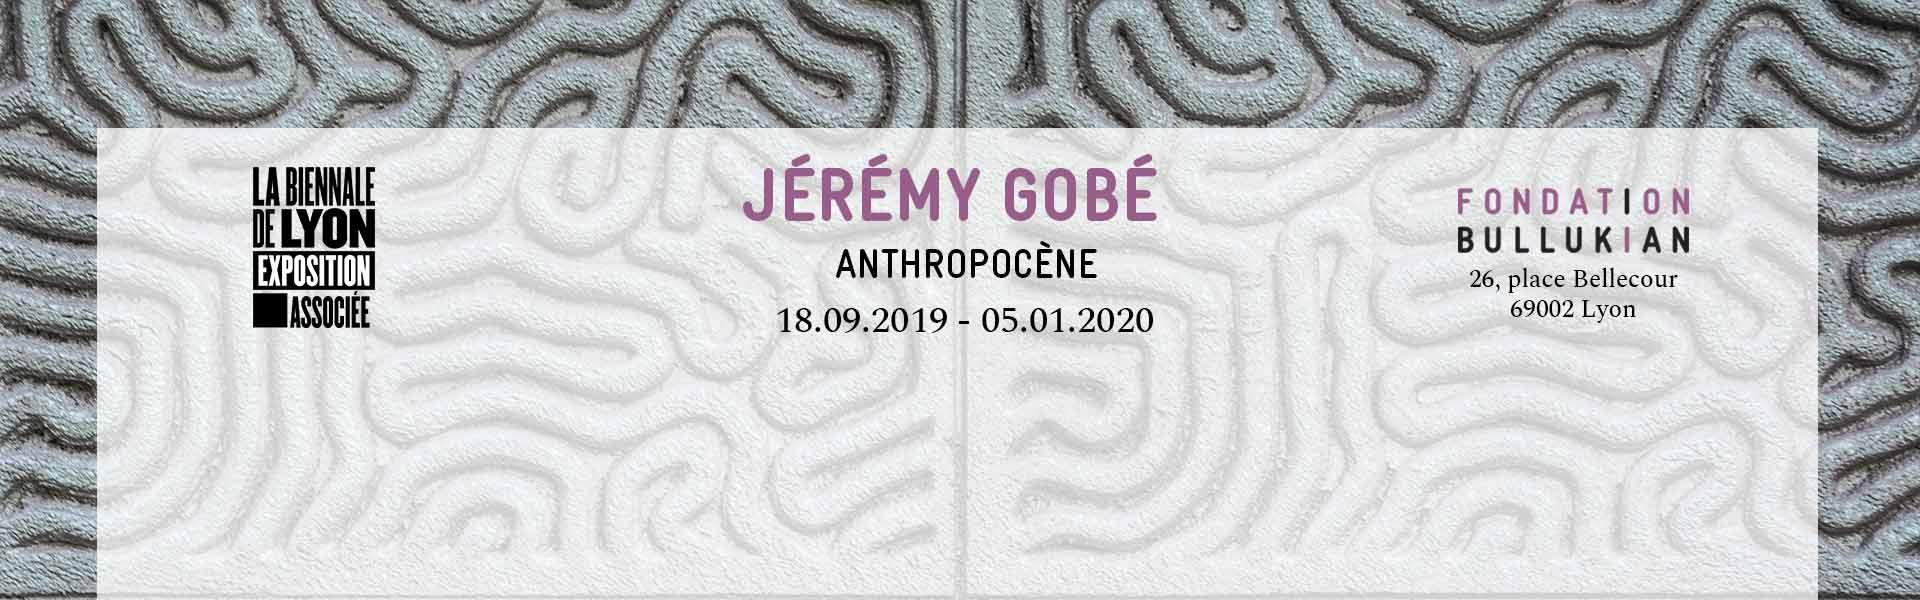 Jeremy Gobe, Anthropocene, Fondation Bullukian